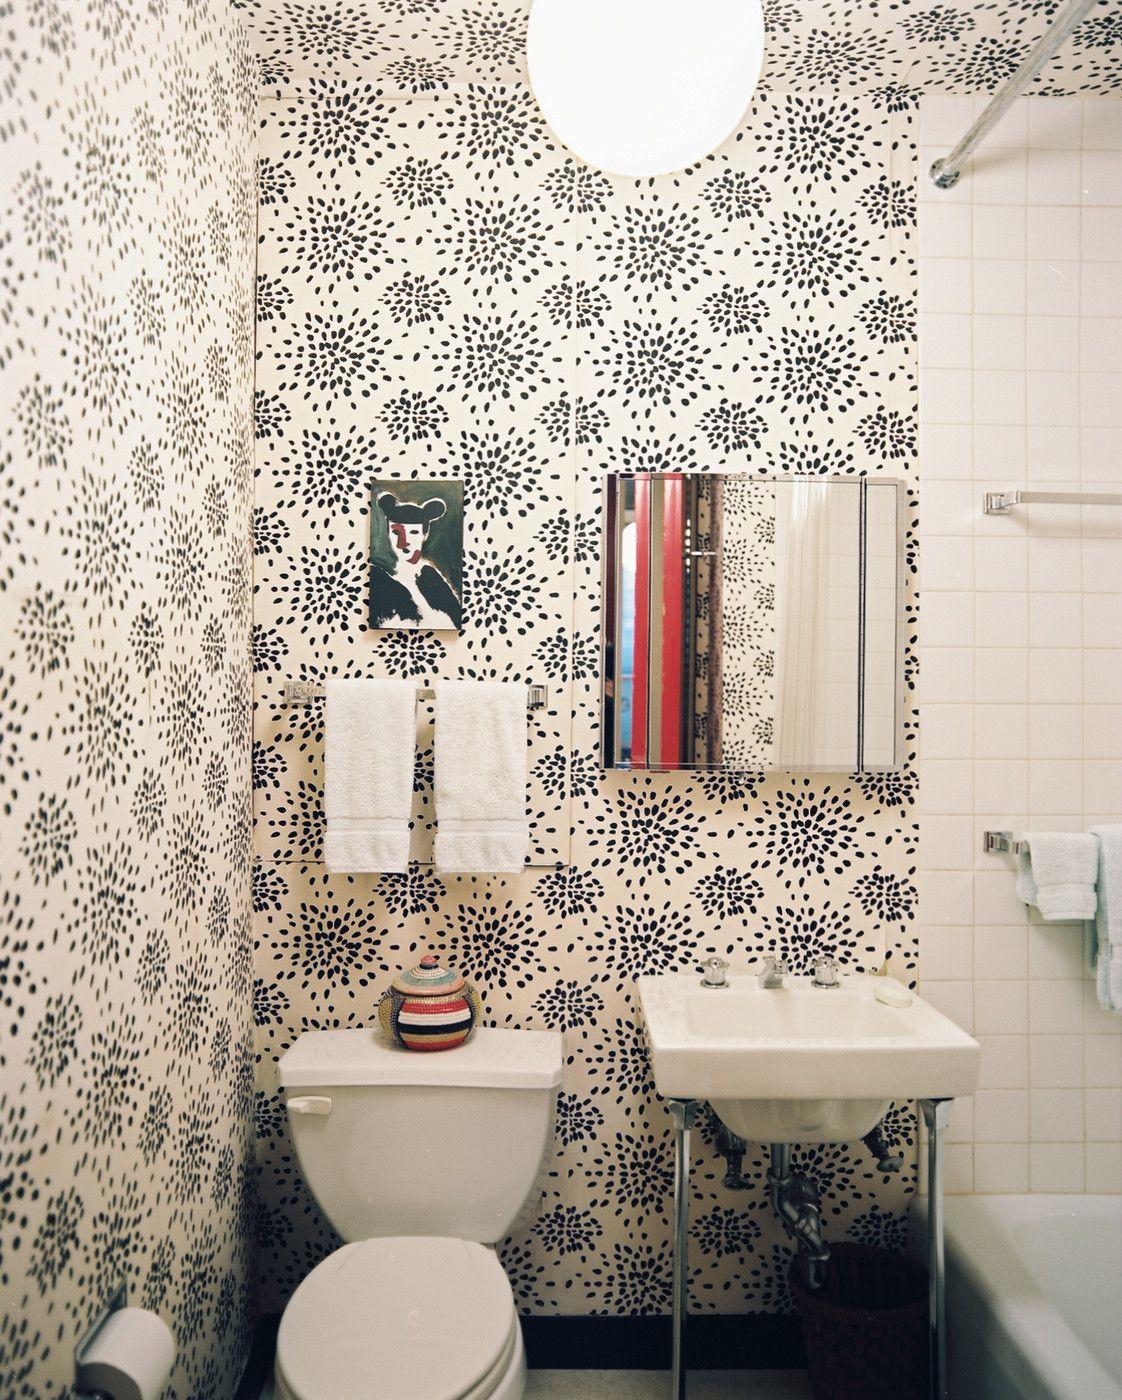 Bathroom Photos  Bathroom Photos Modern Bathroom And Wallpaper Prepossessing Small Bathroom Wallpaper Ideas Design Inspiration